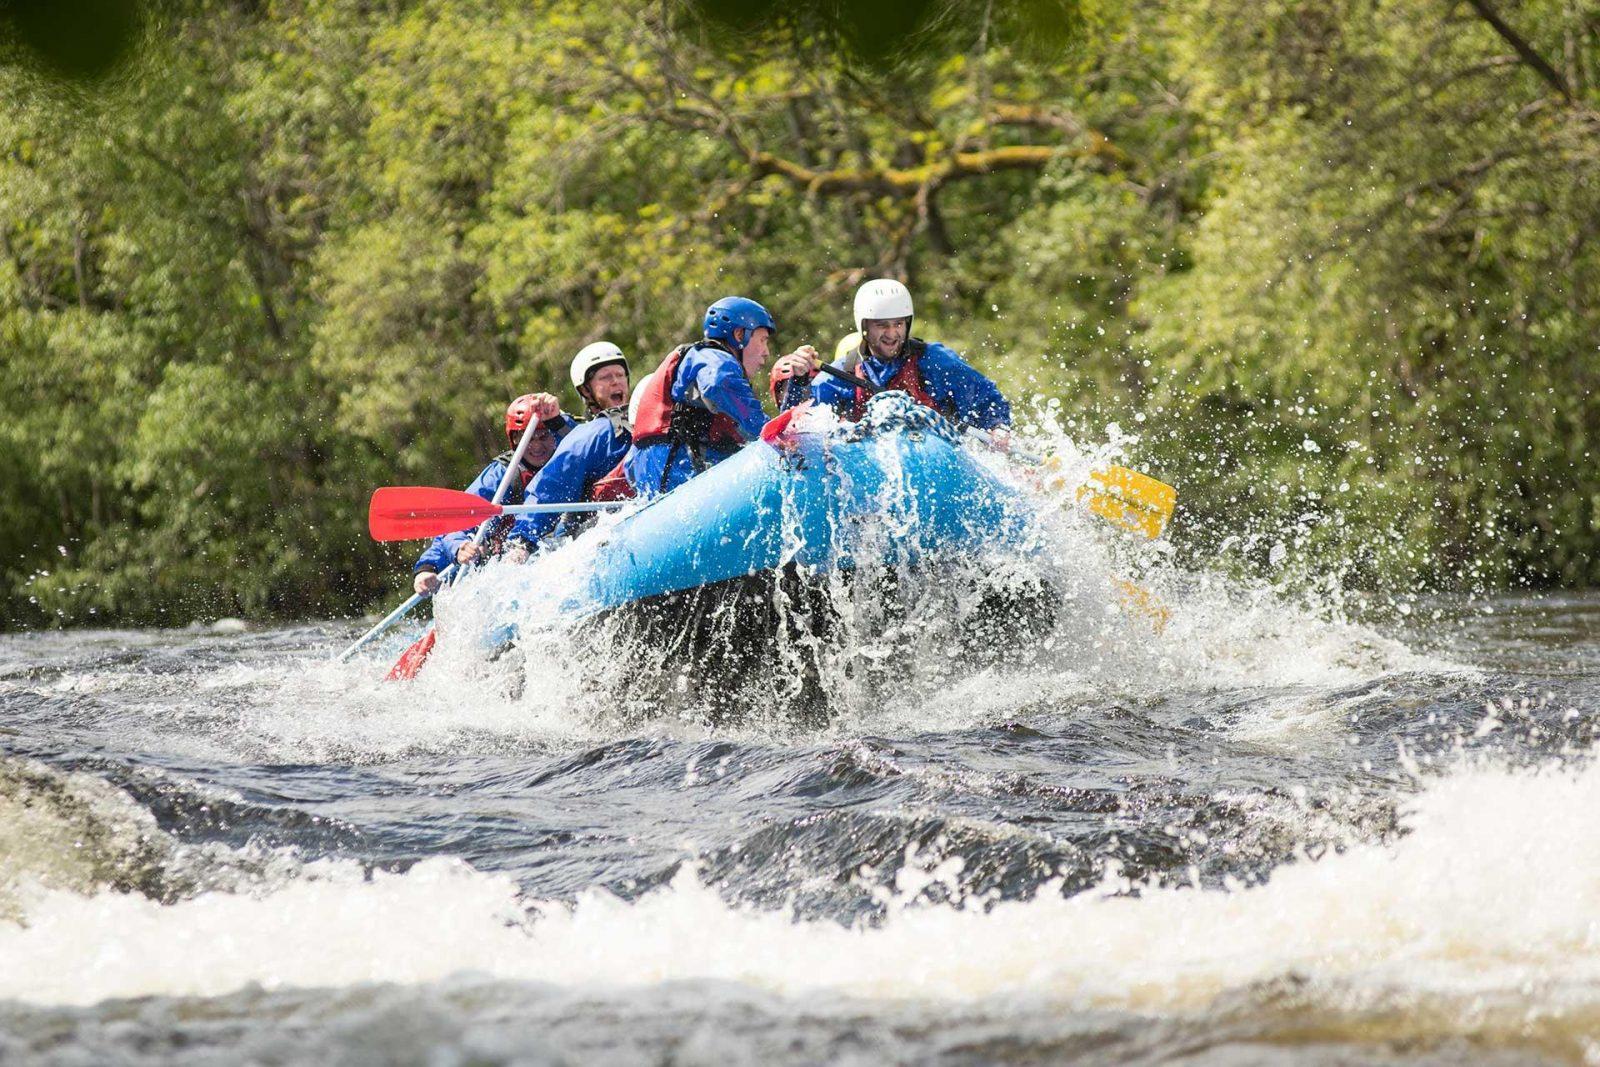 Scotland Corporate Travel Team Building - Canyoning in Allt a'Bhealaich